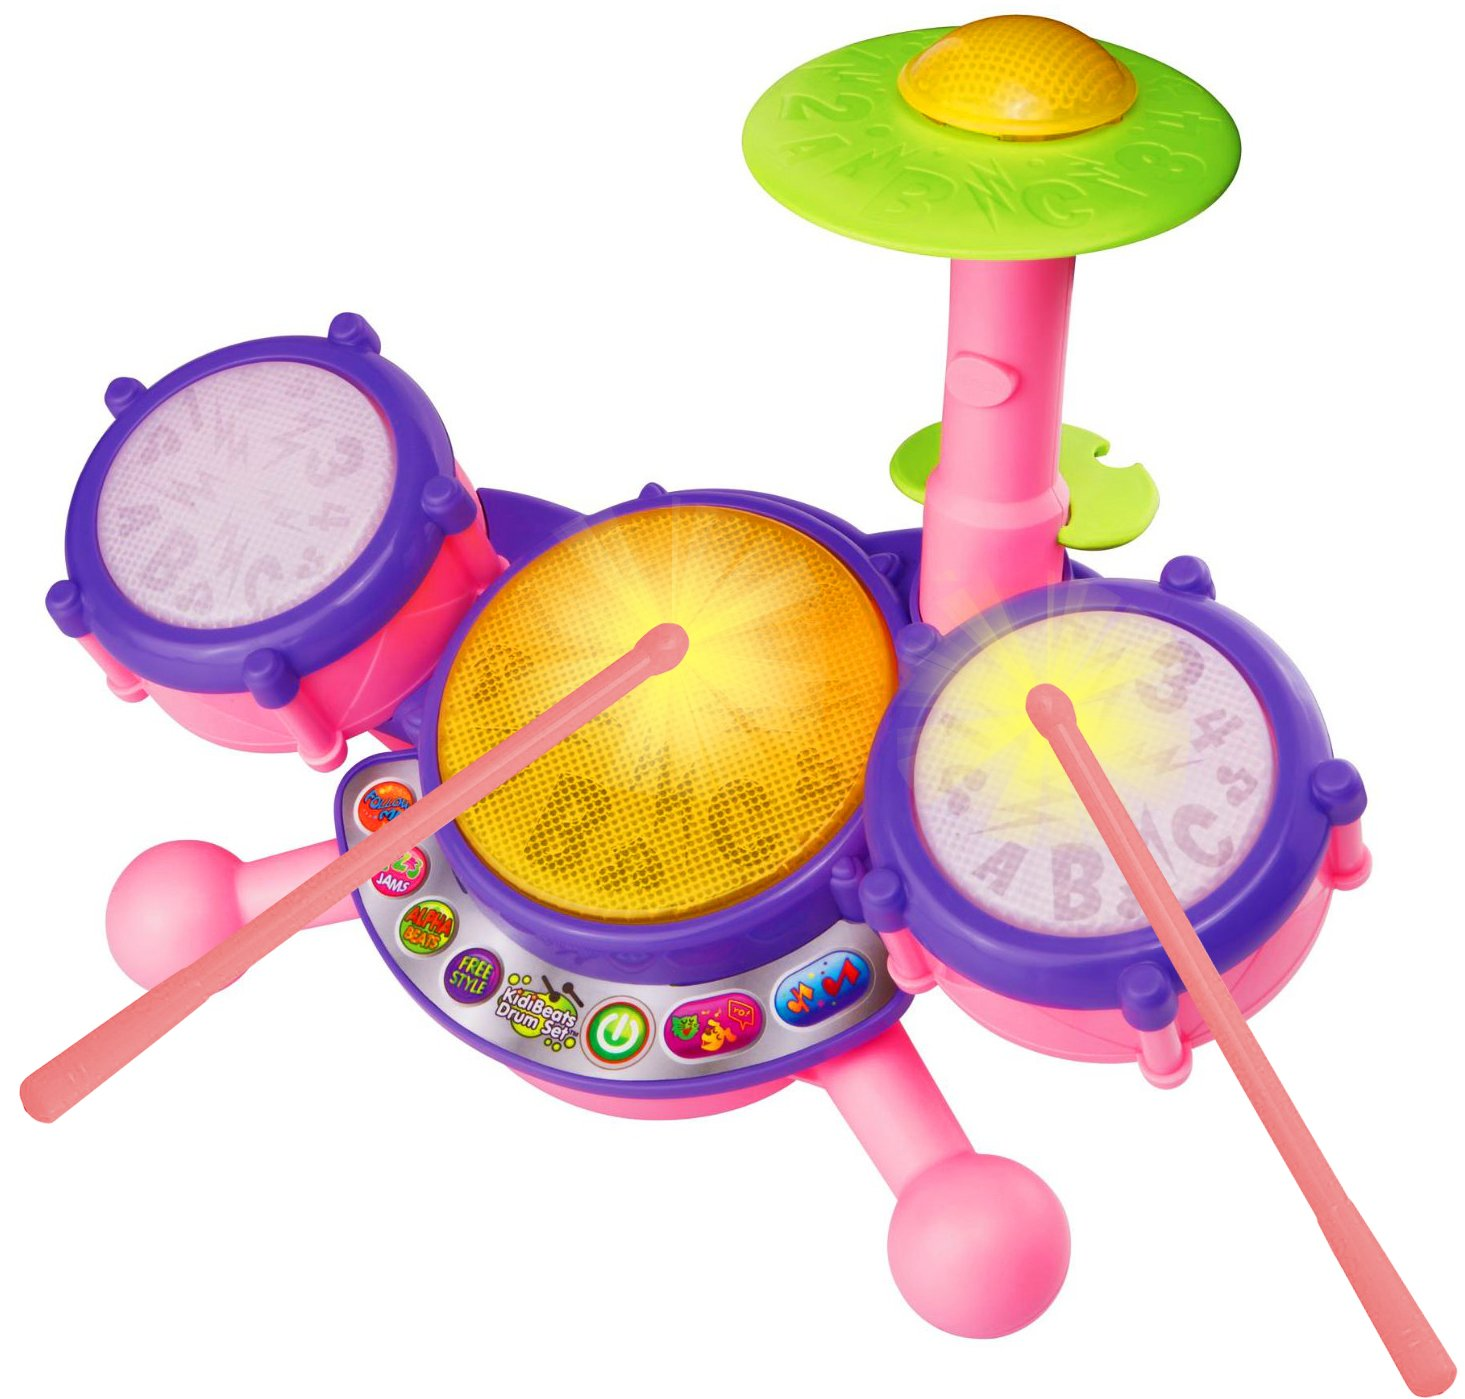 Kidibeats Vtech Drum Set